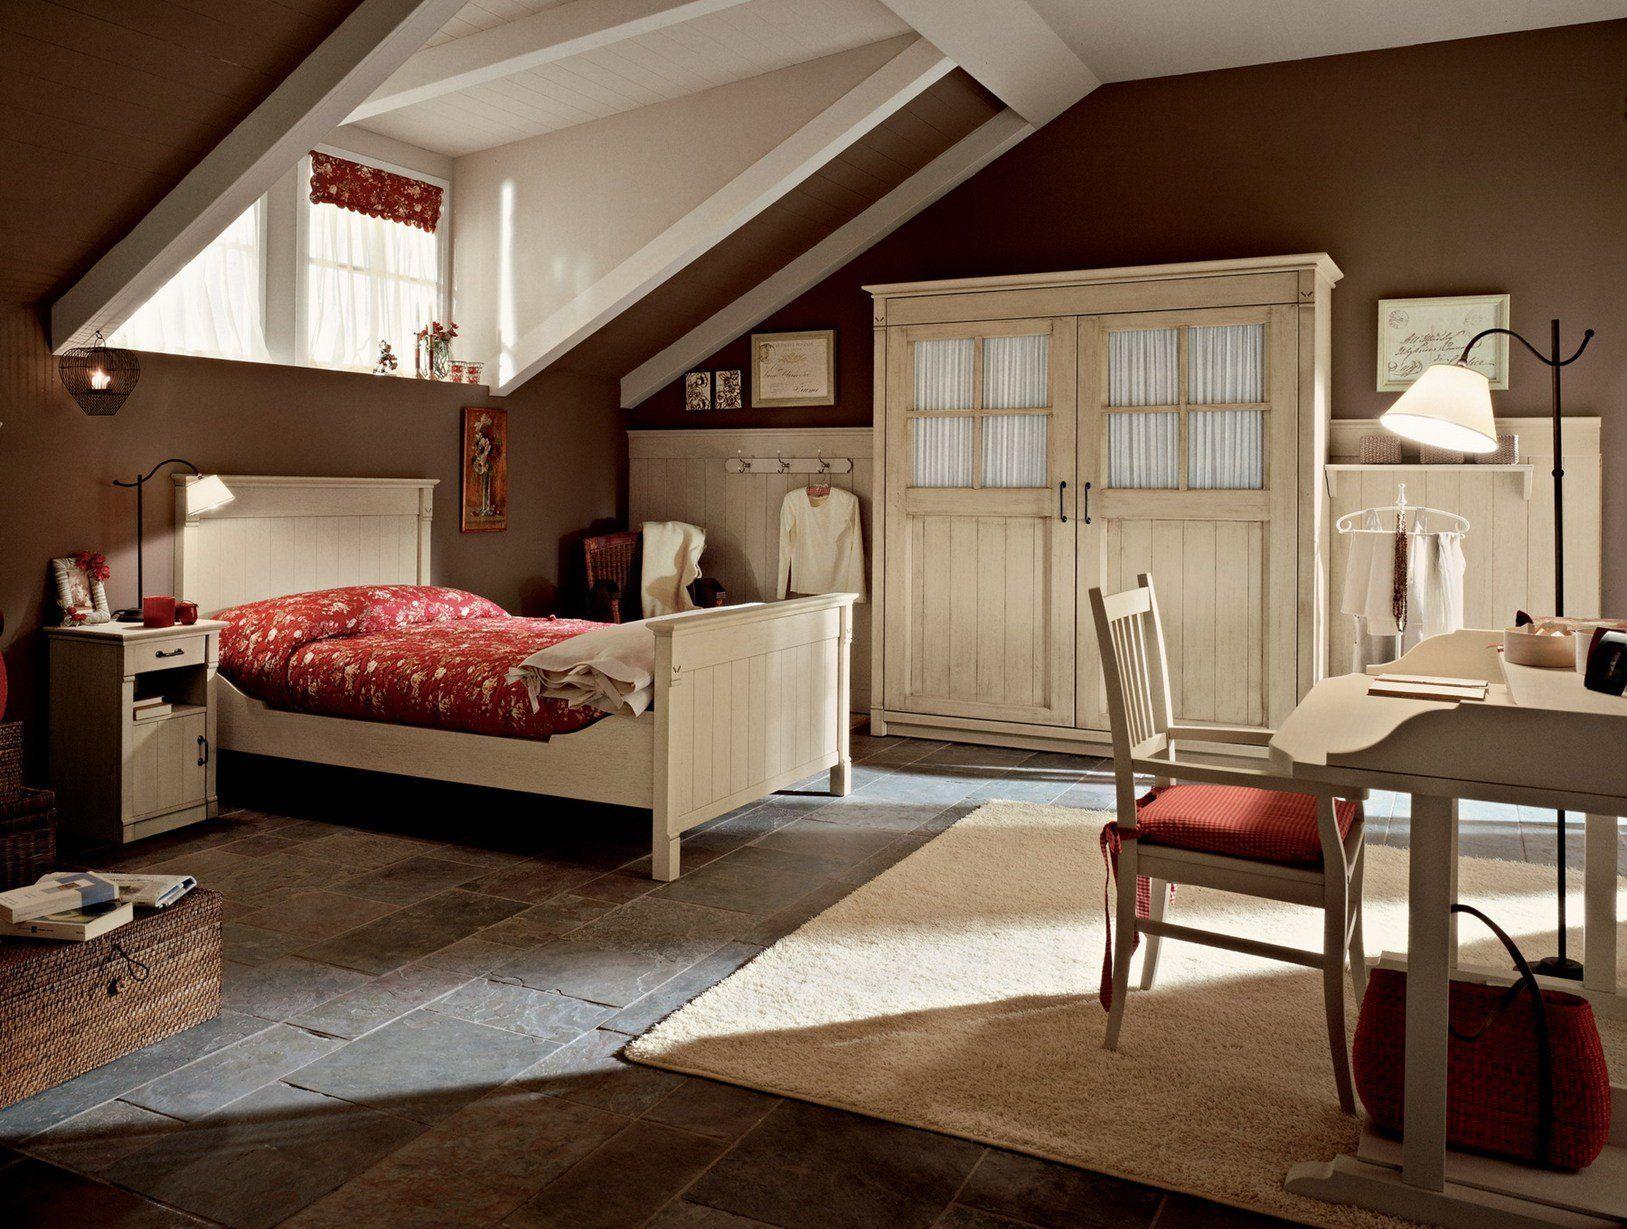 Картинки комнат в английских домах